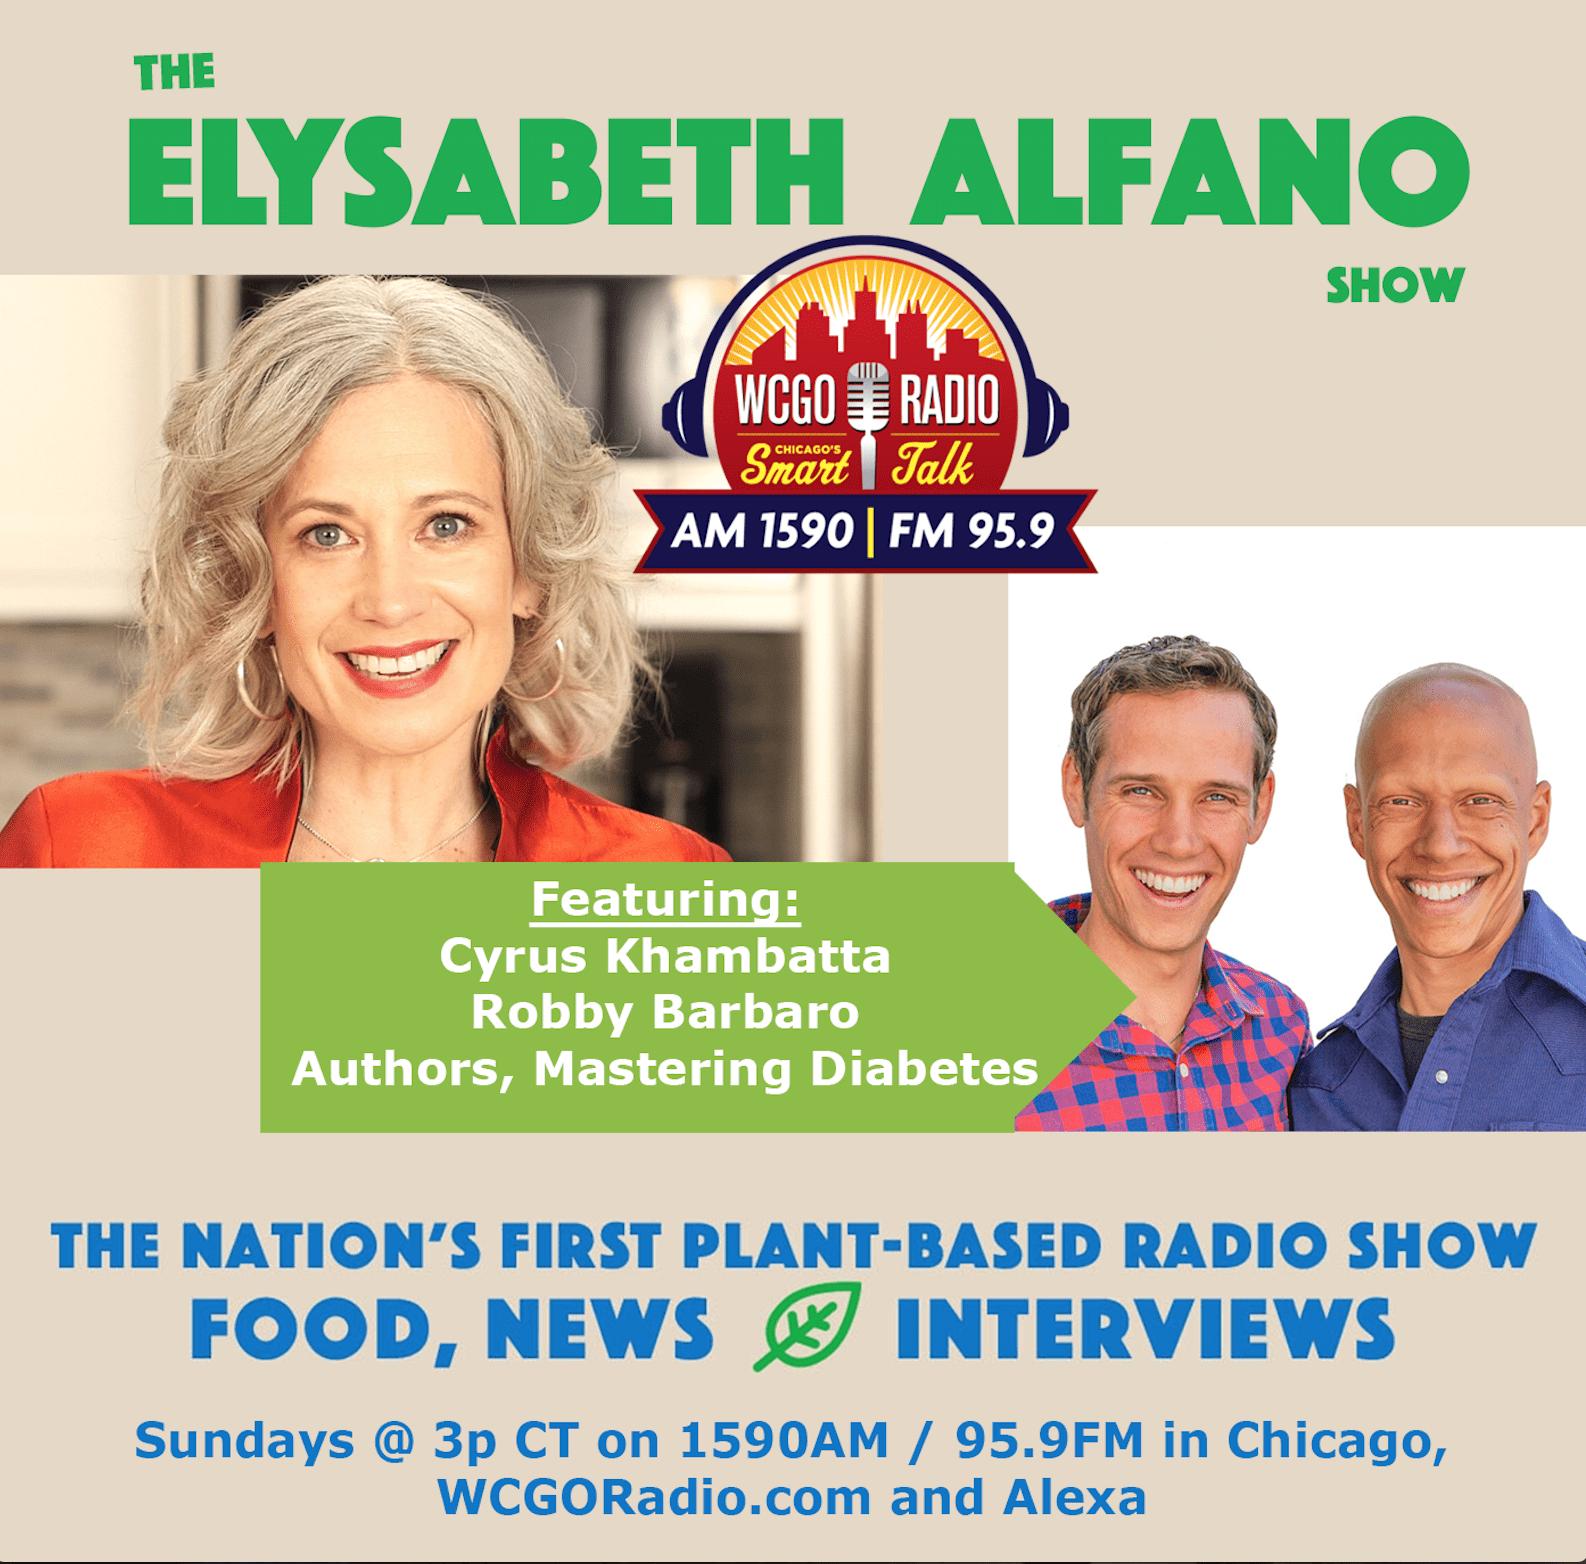 Elysabeth Alfano Radio Show